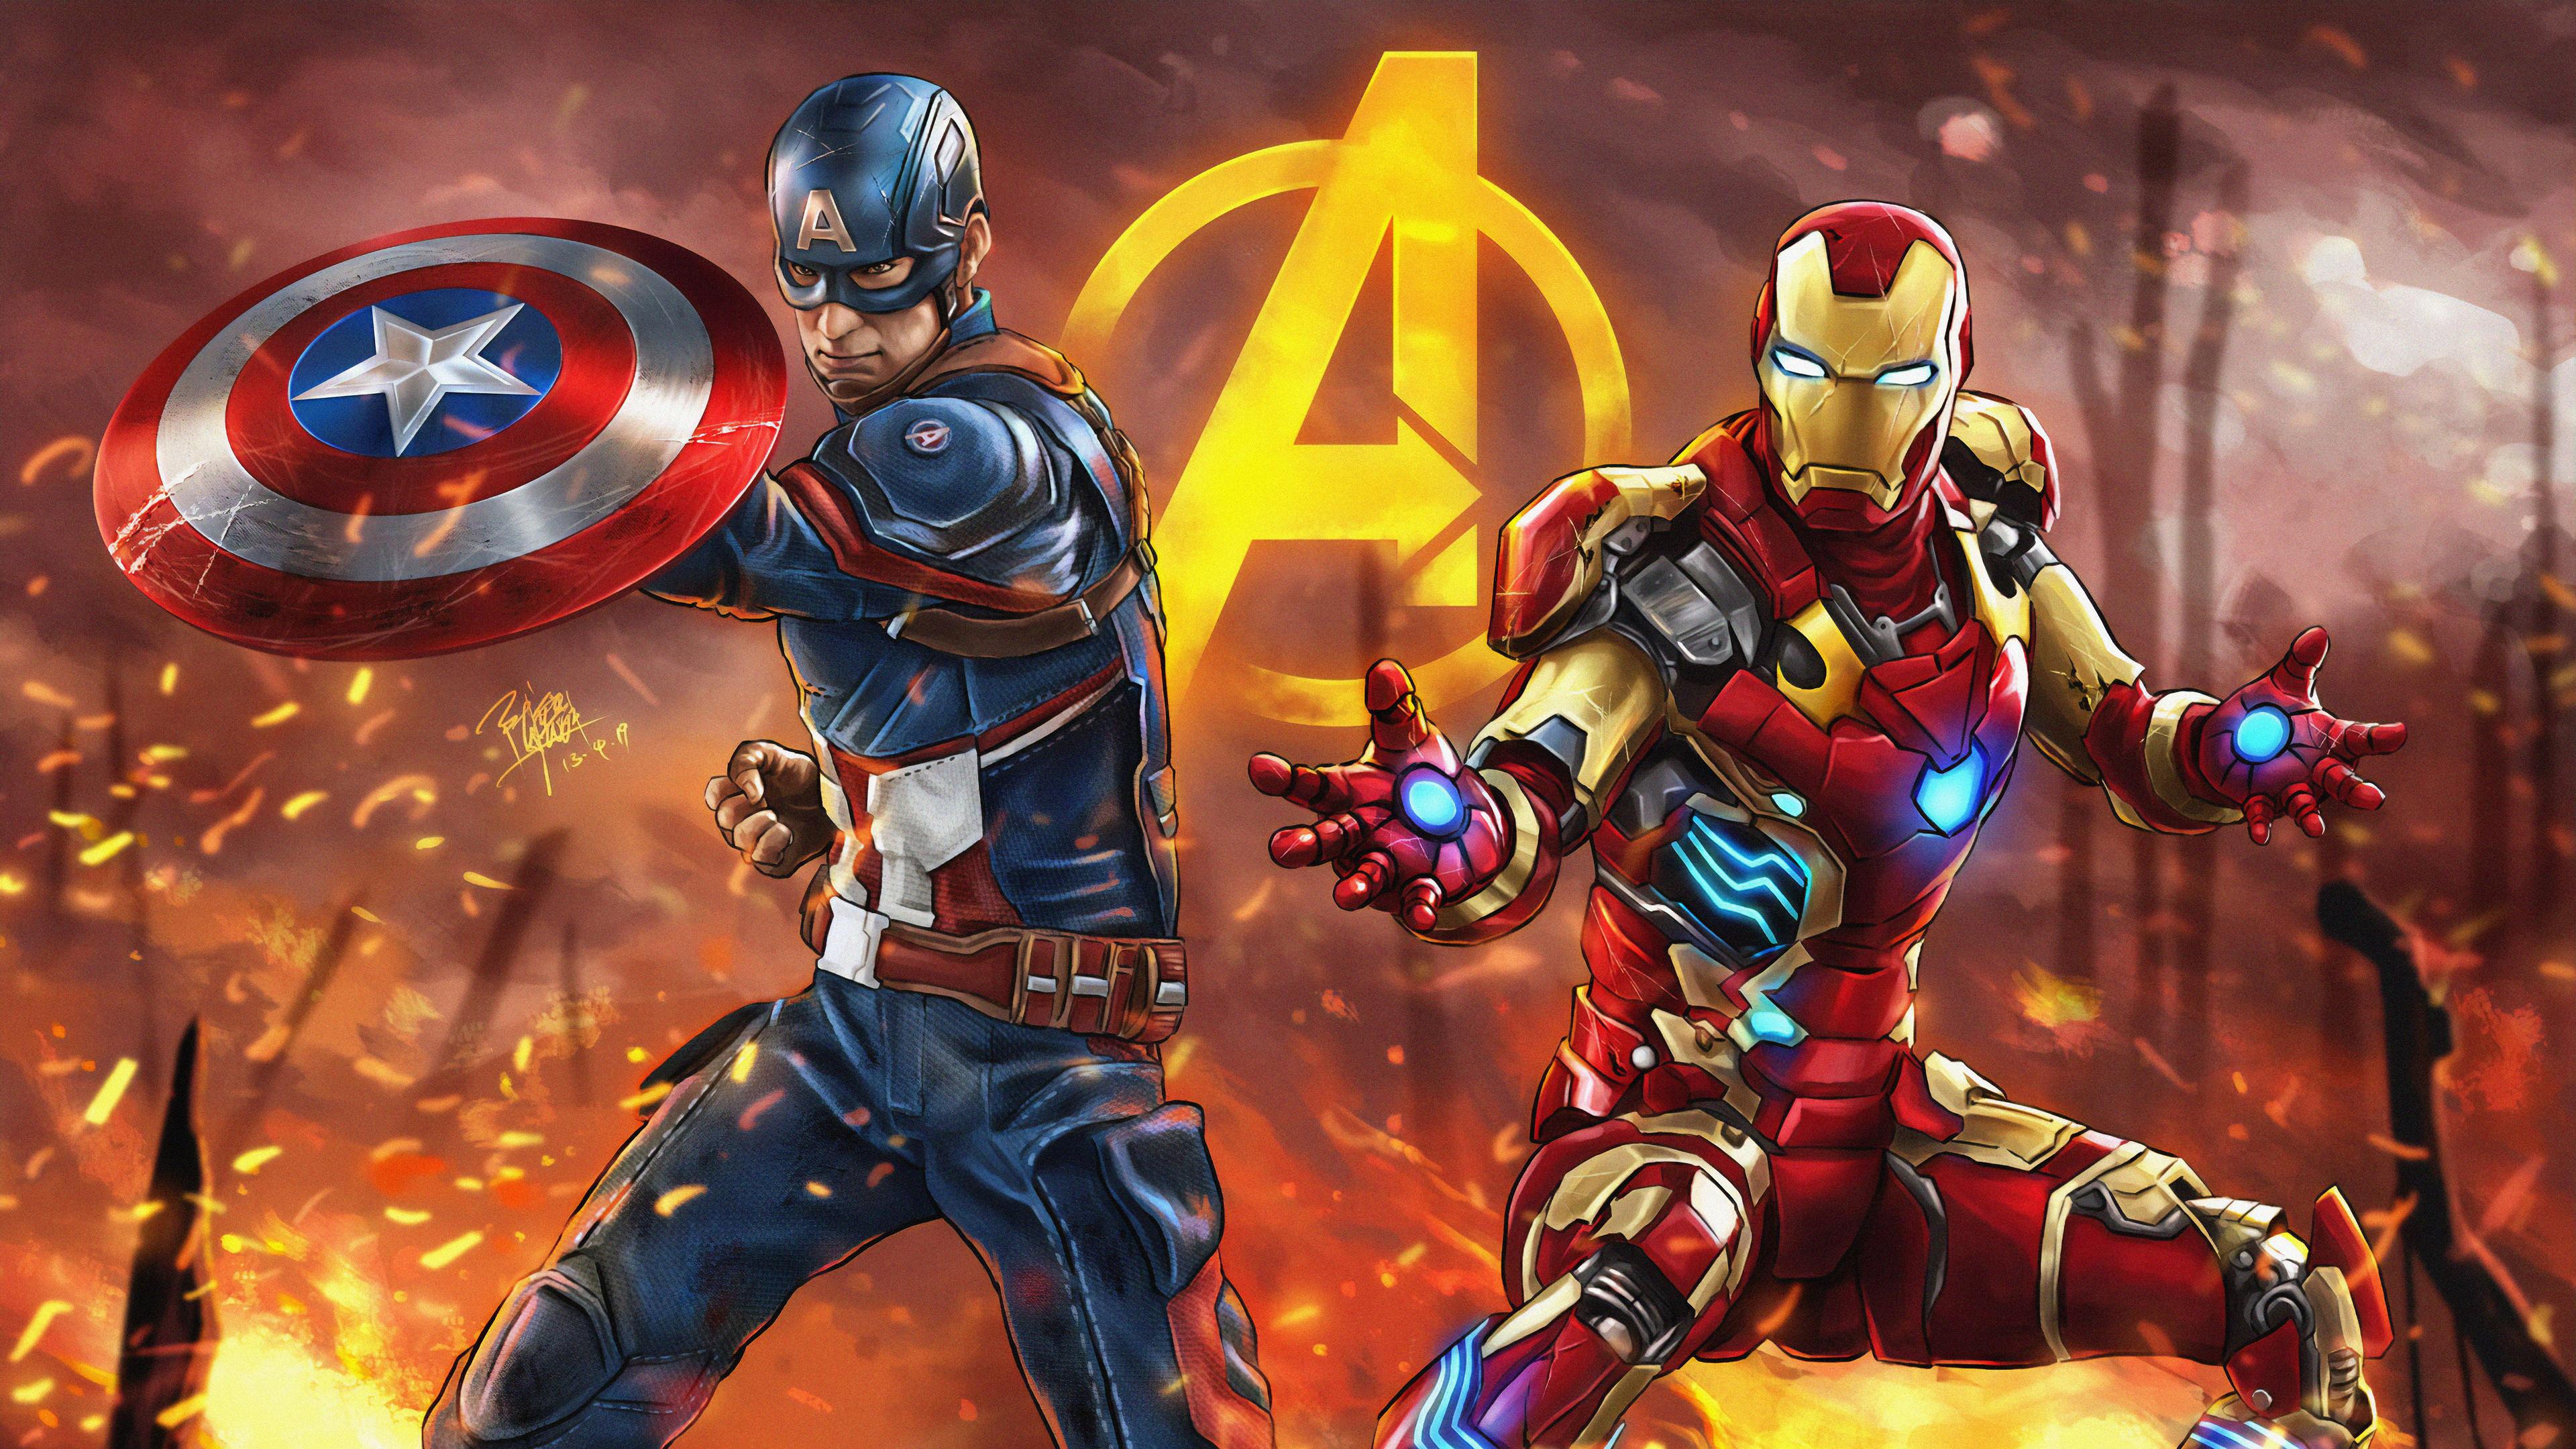 captain america and iron man 1563219822 - Captain America And Iron Man - superheroes wallpapers, iron man wallpapers, hd-wallpapers, captain america wallpapers, artwork wallpapers, 4k-wallpapers